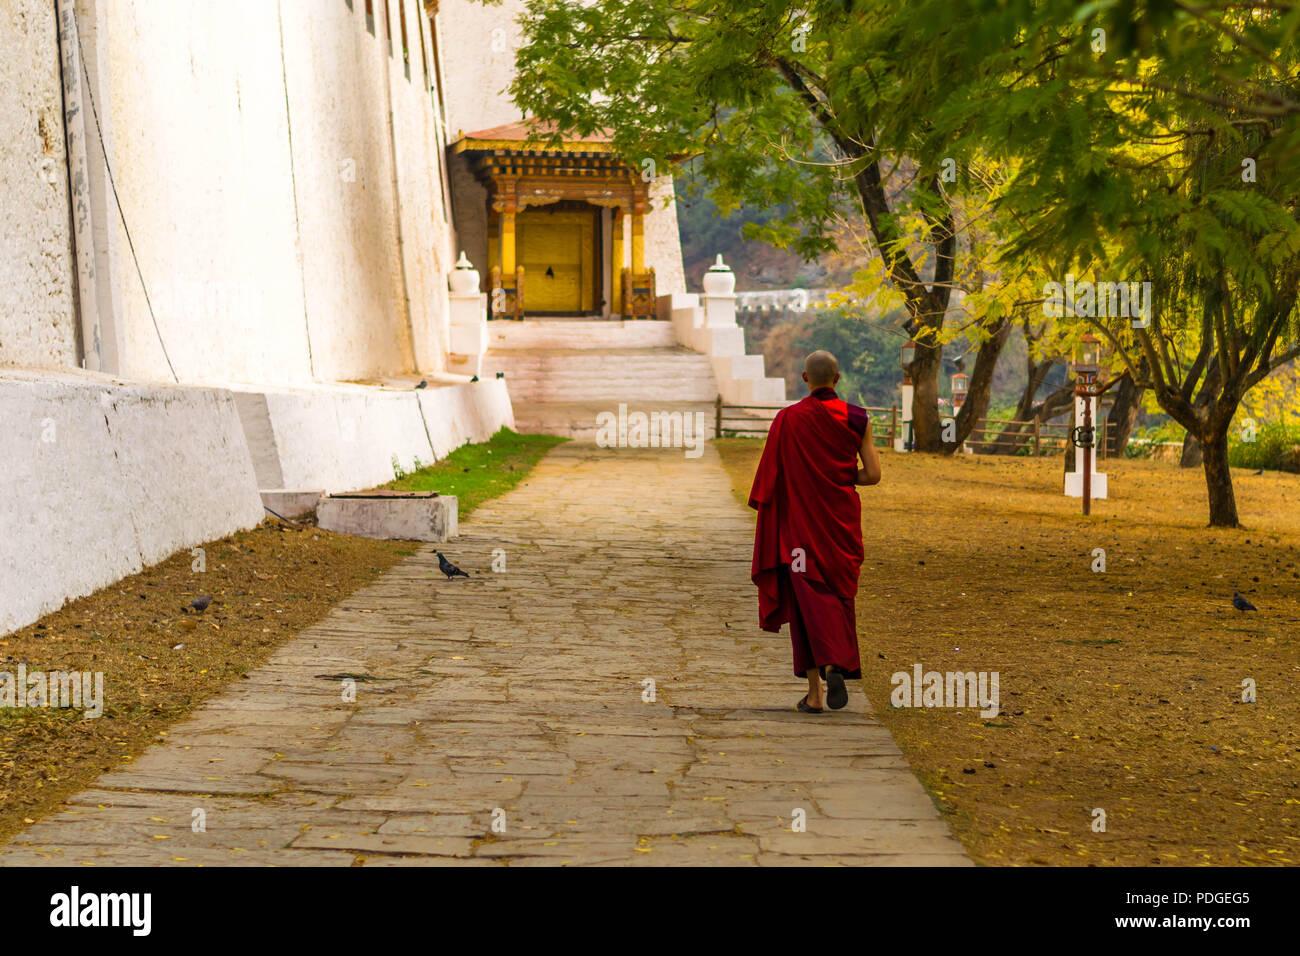 Buddhist Monk at Punakha Monastery in Bhutan - Stock Image